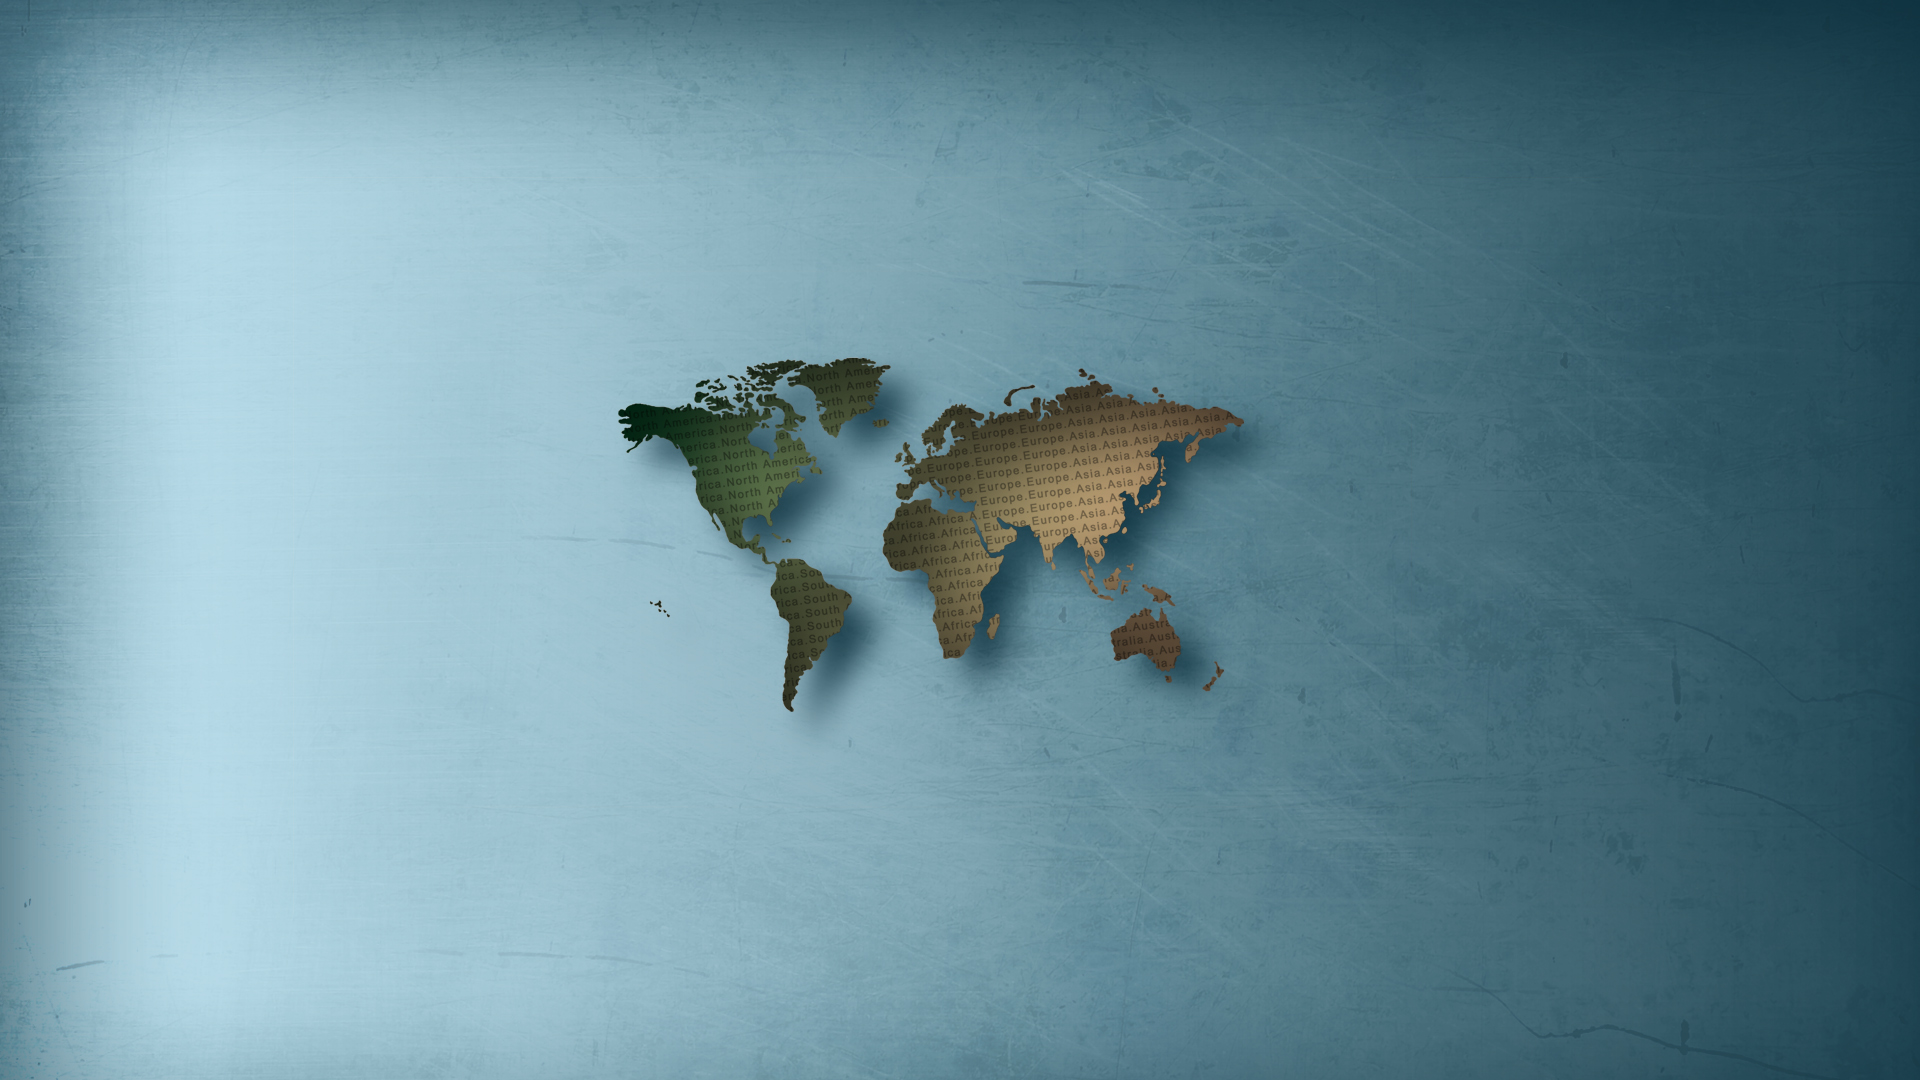 world map color by phauxington on deviantart